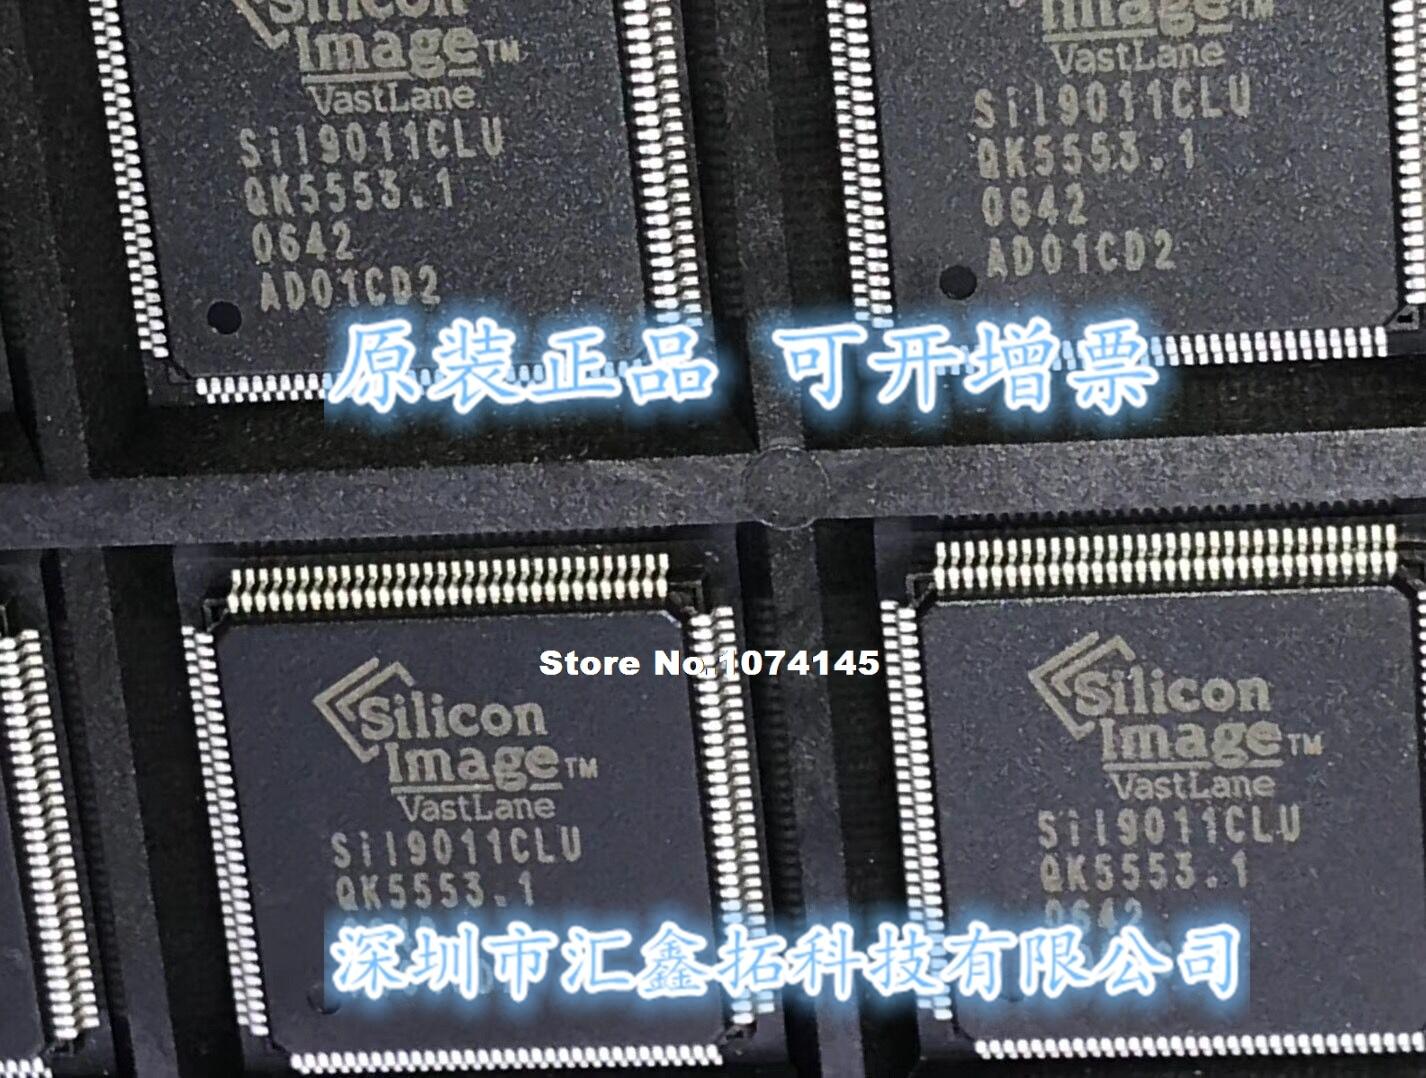 5pcs/lot SiL9011CLU SII9011CLU QFP 5pcs lot original as19 h1g as19 h1 as19 h as19 ecmos qfp 48 best quality new